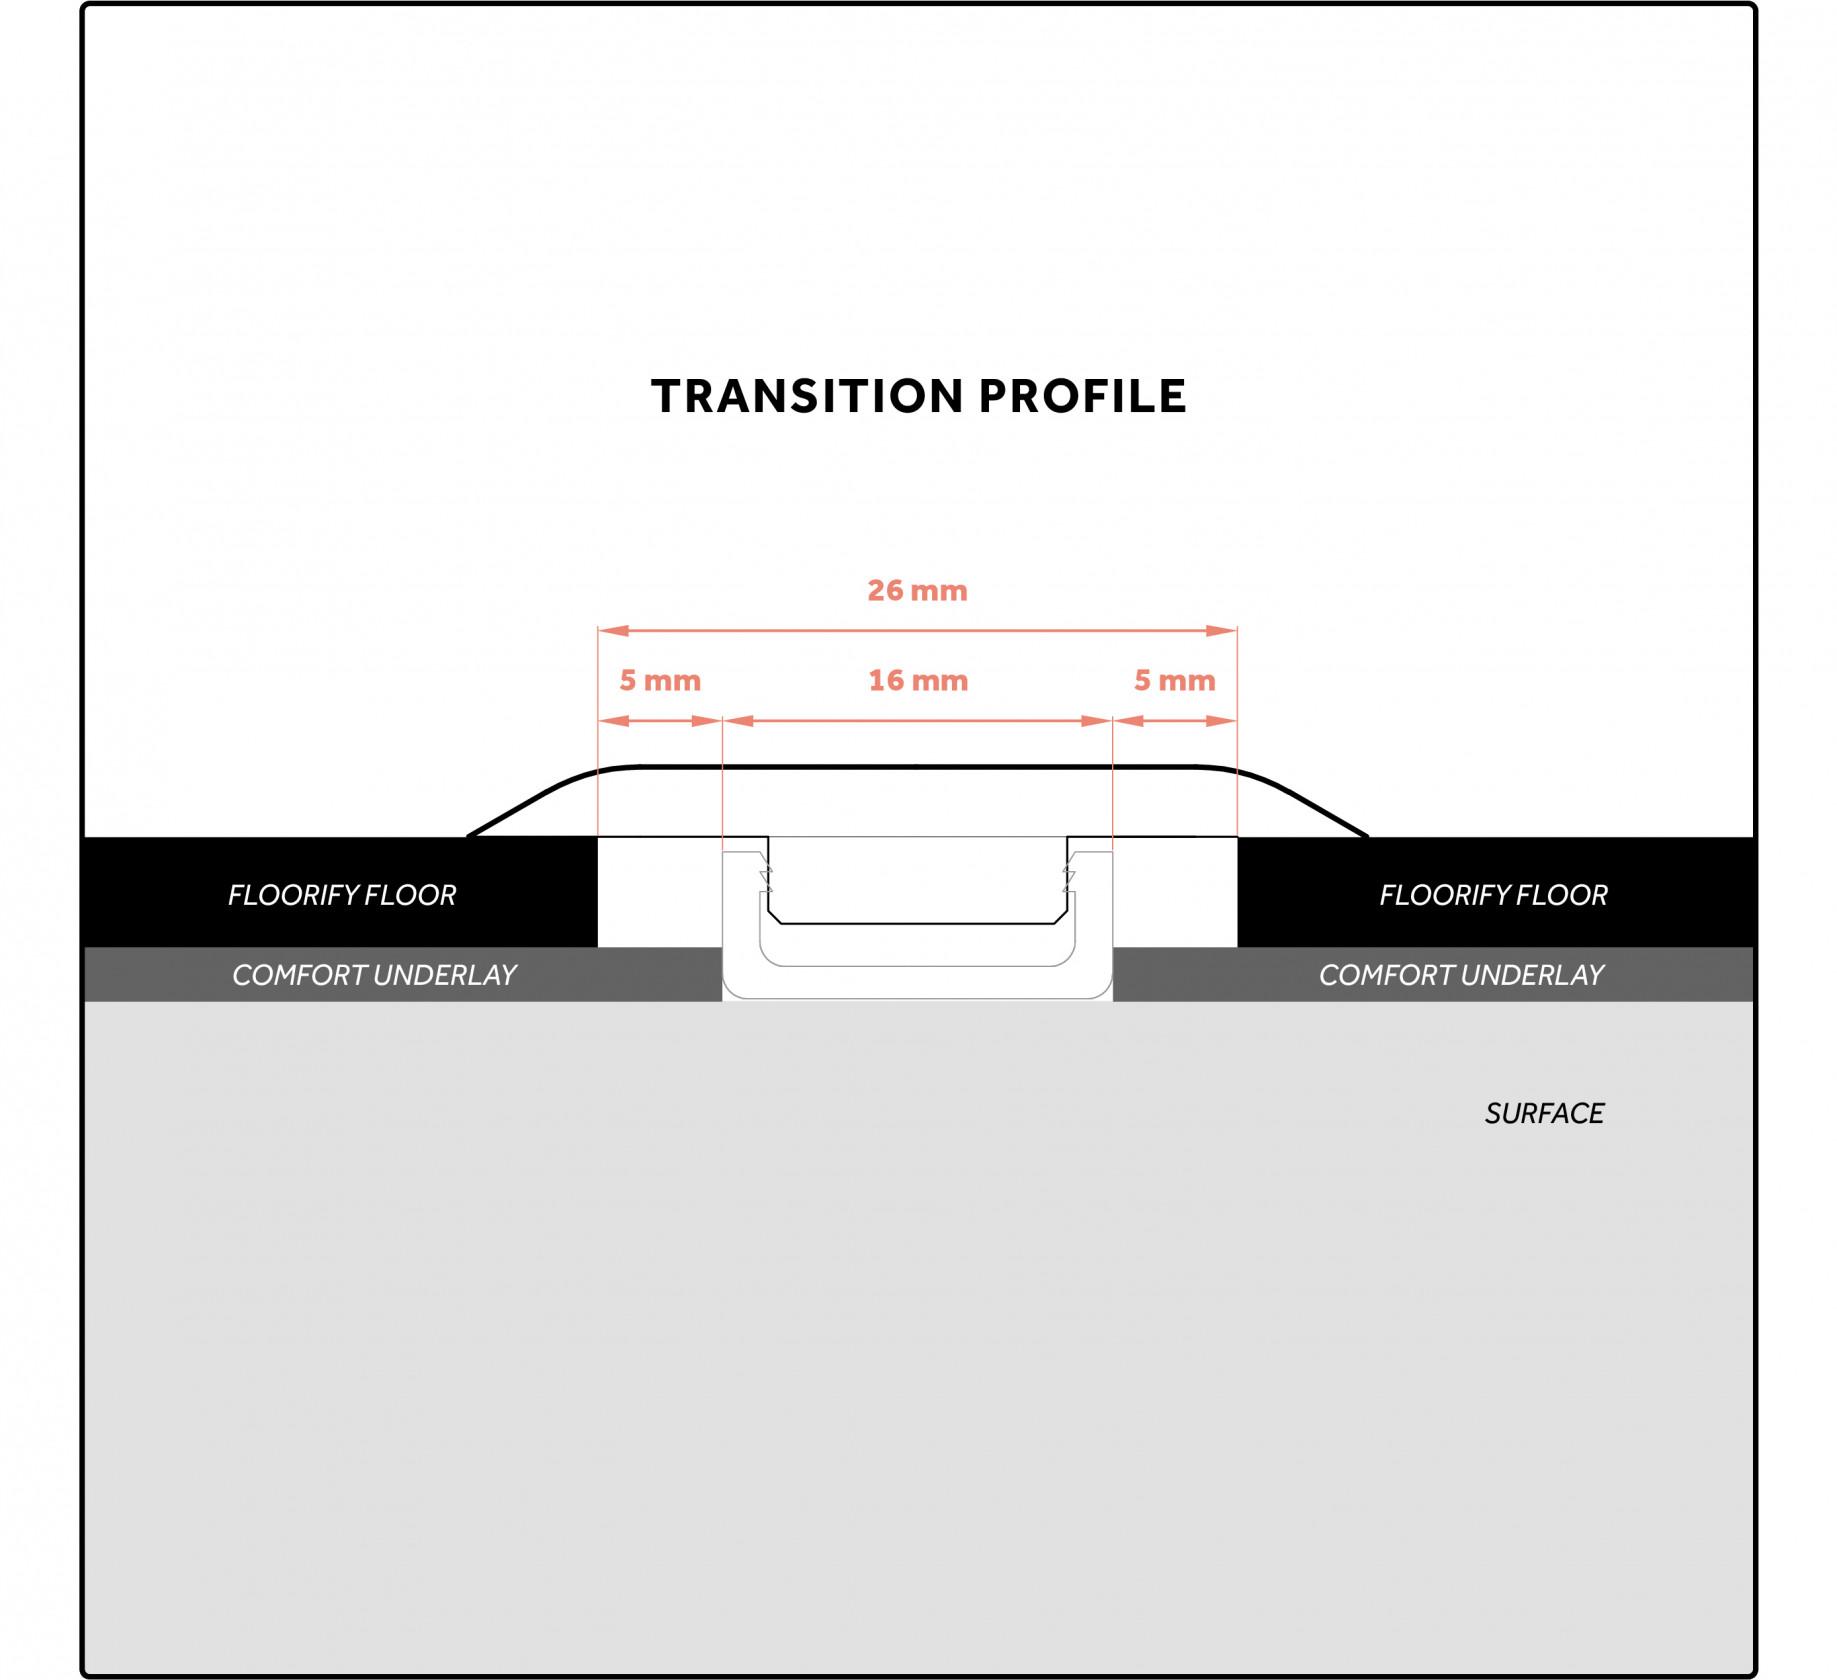 Floorify - Transition profile.jpg